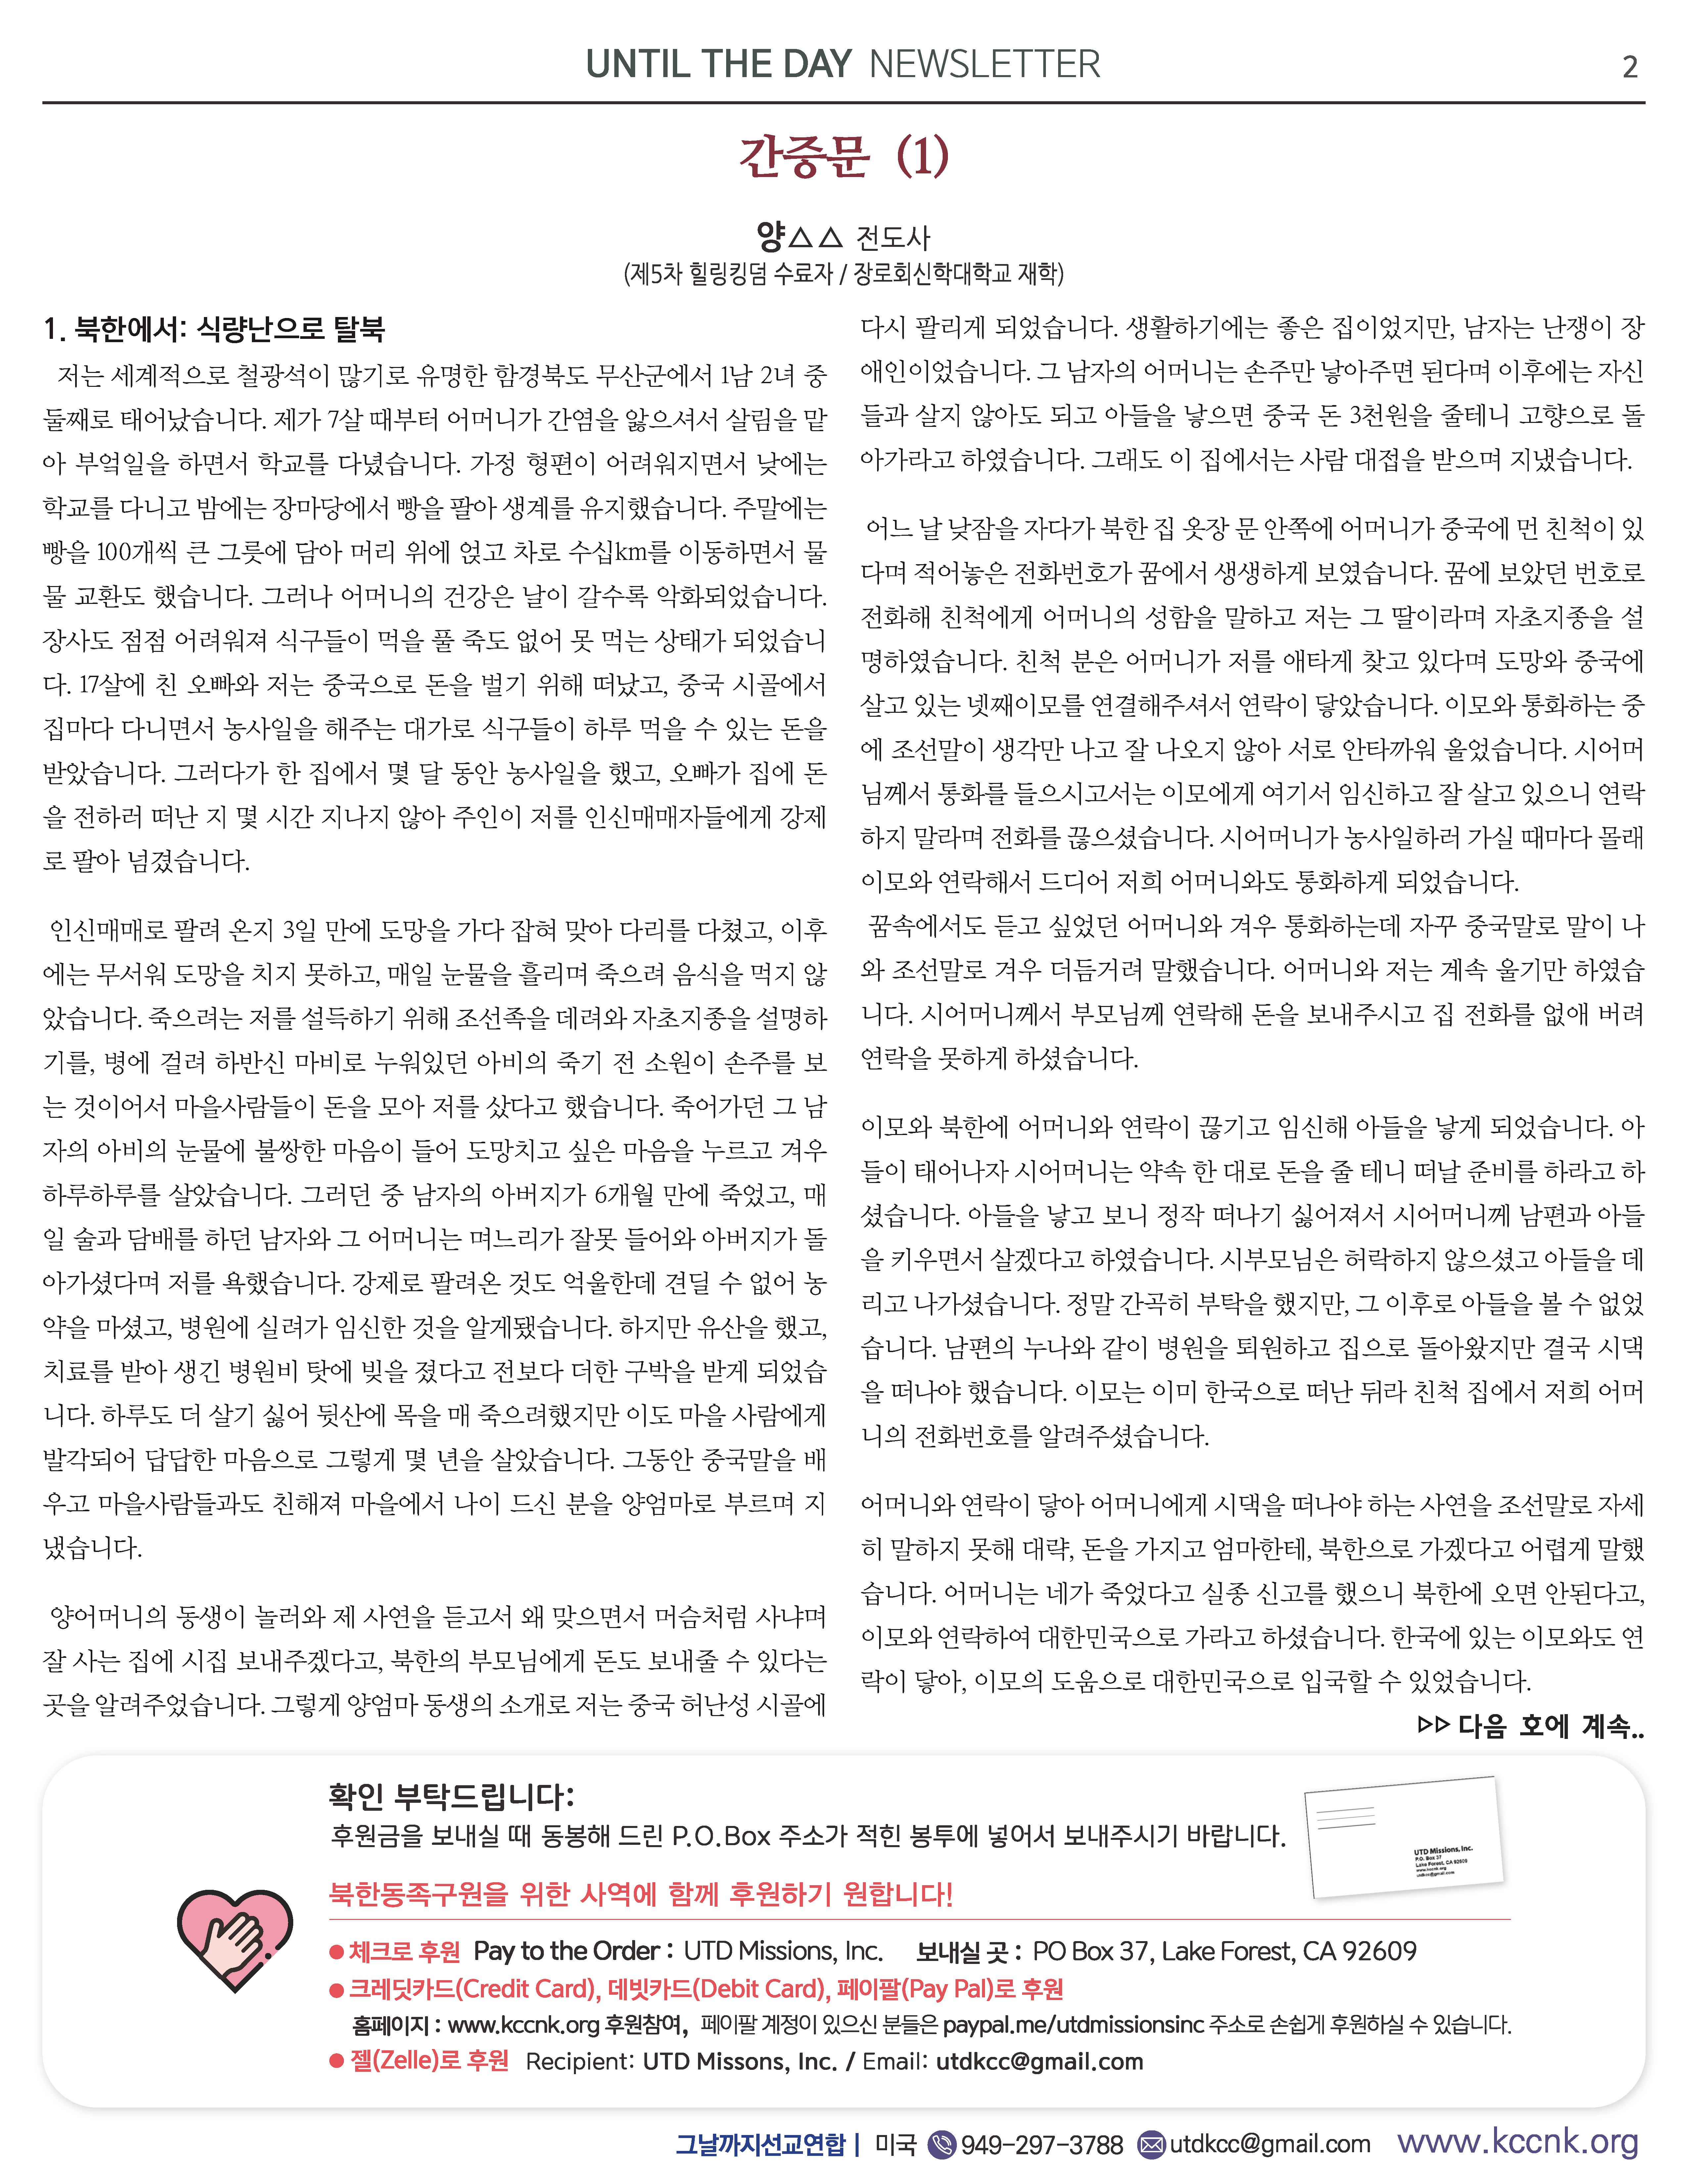 202106 UTD Newsletter_US_페이지_2.jpg